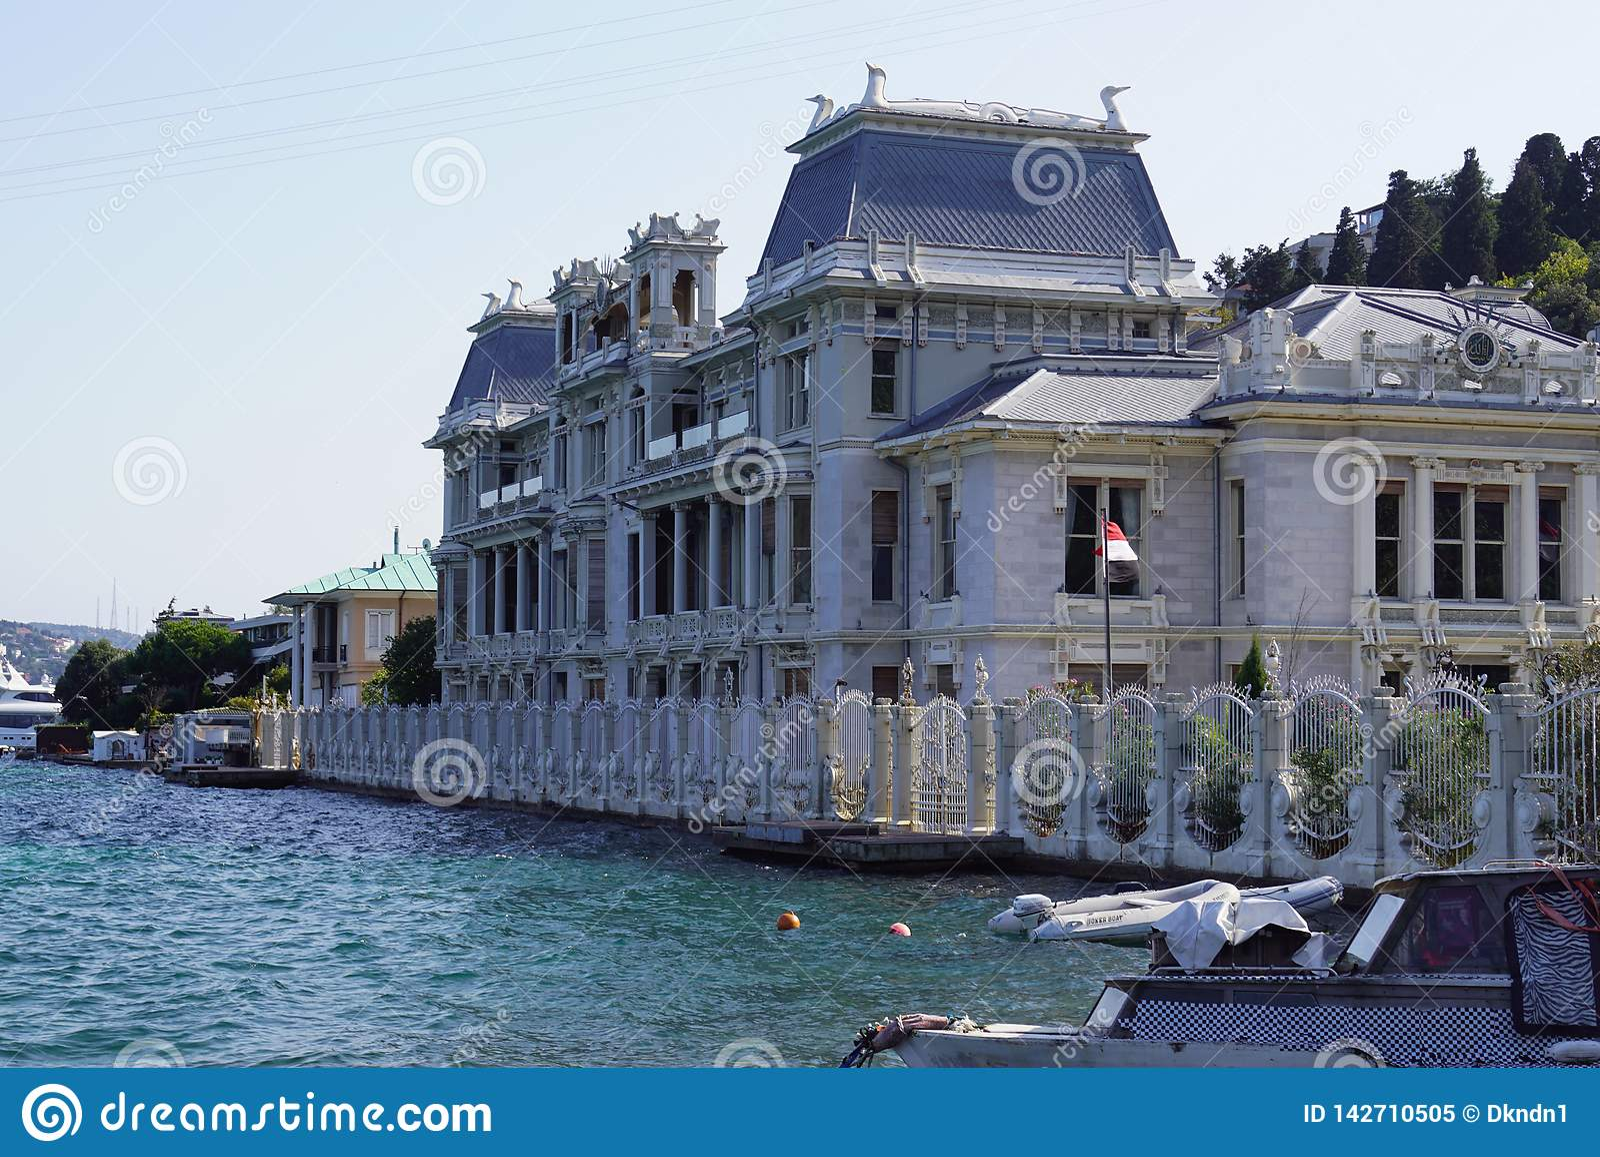 Ä°stanbul, Marmara/Τουρκία 10 03 2019: Προξενείο της Αιγύπτου